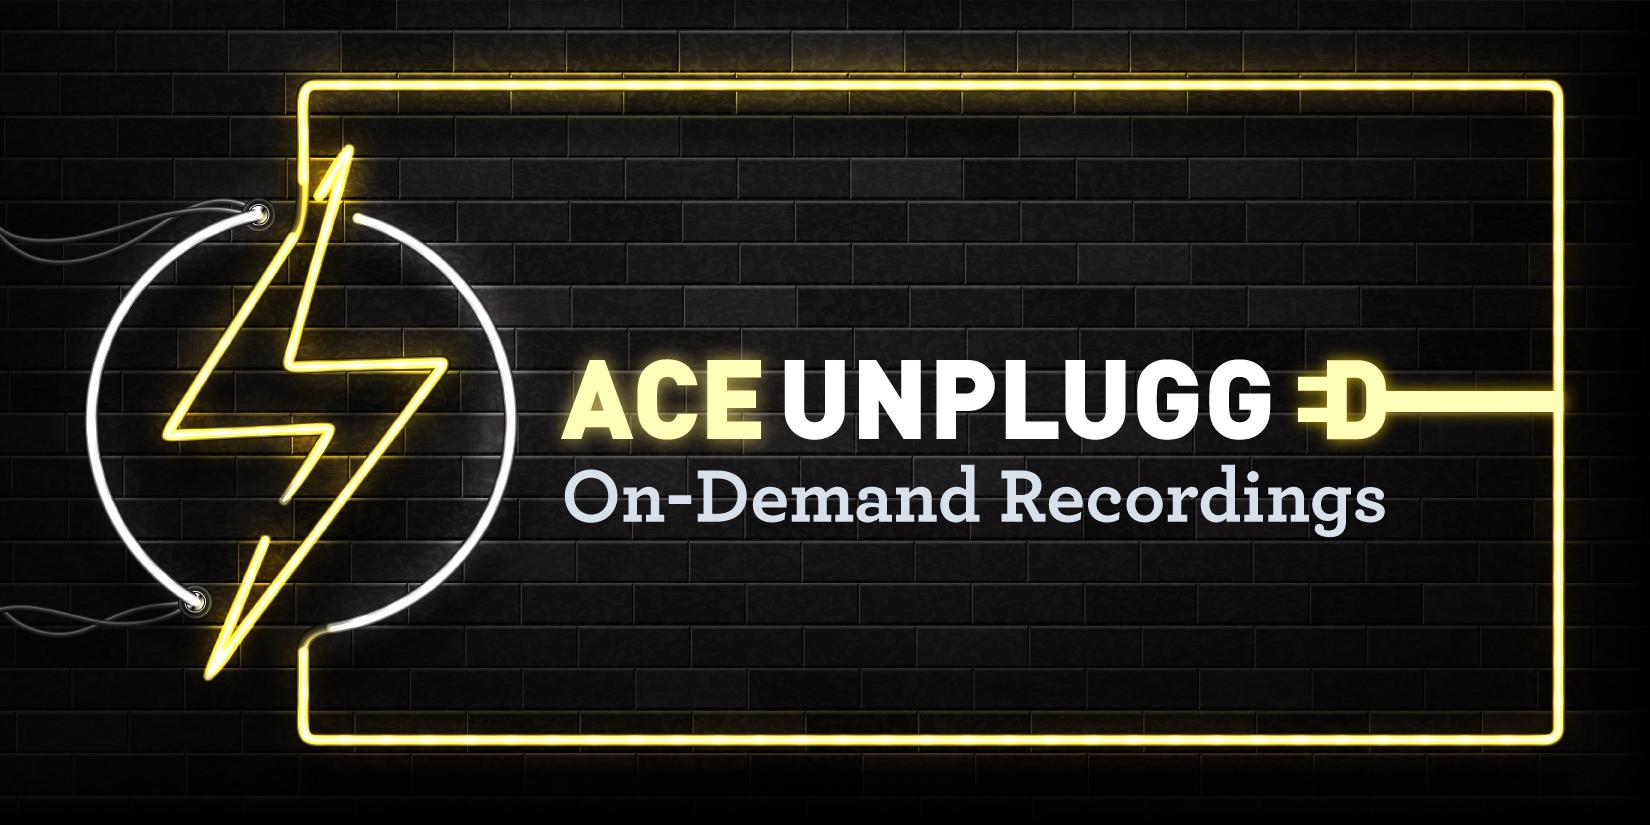 ace unplugged